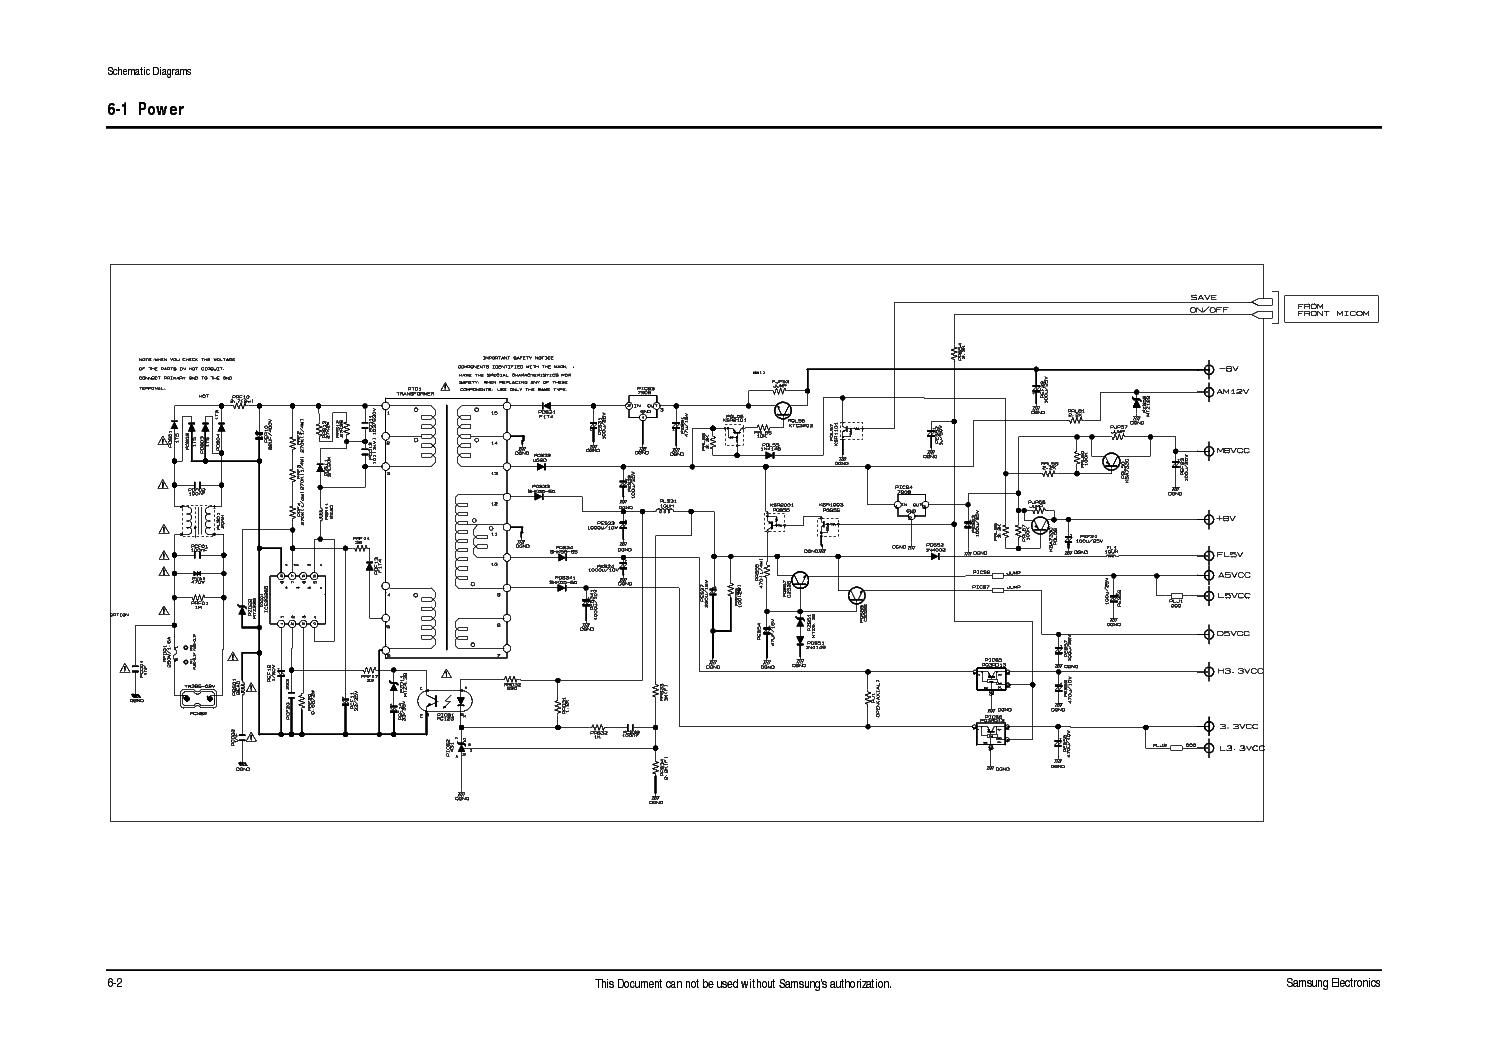 hight resolution of samsung dvd hd945 service manual download schematics eeprom samsung dvd hd945 schematic diagram